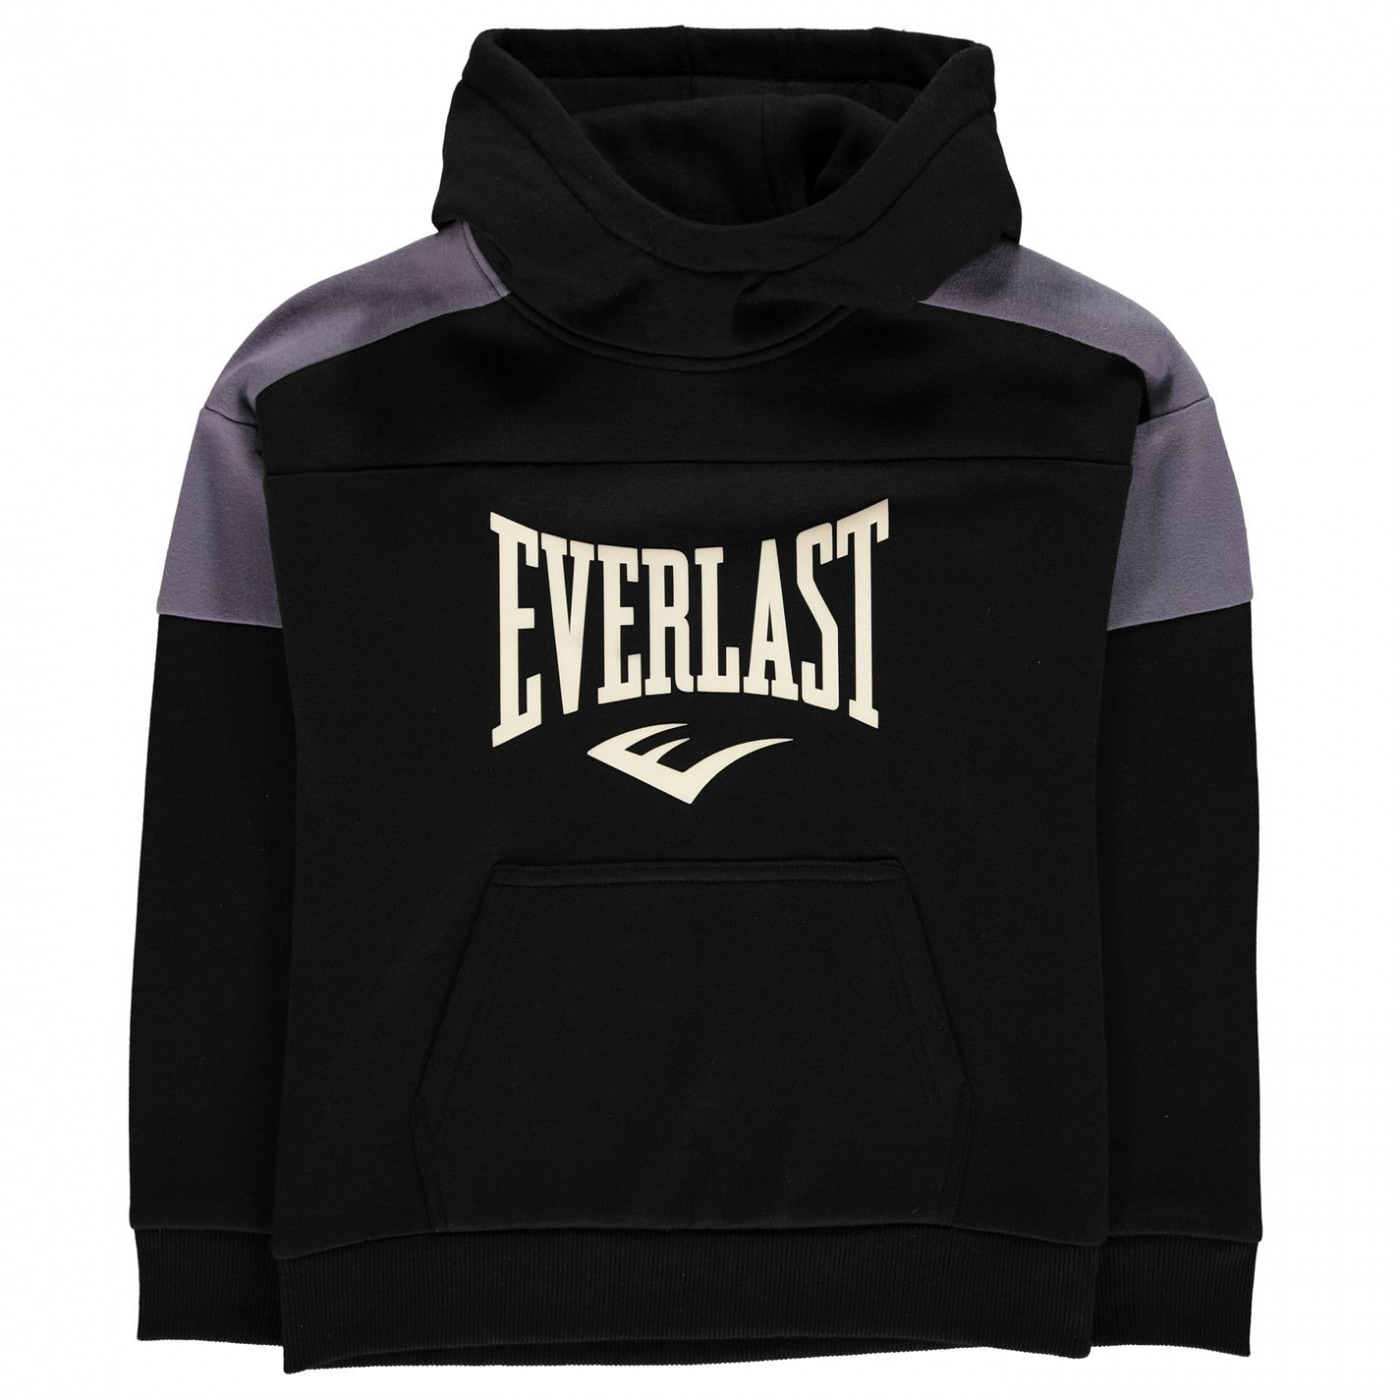 Everlast C&S Hoodie